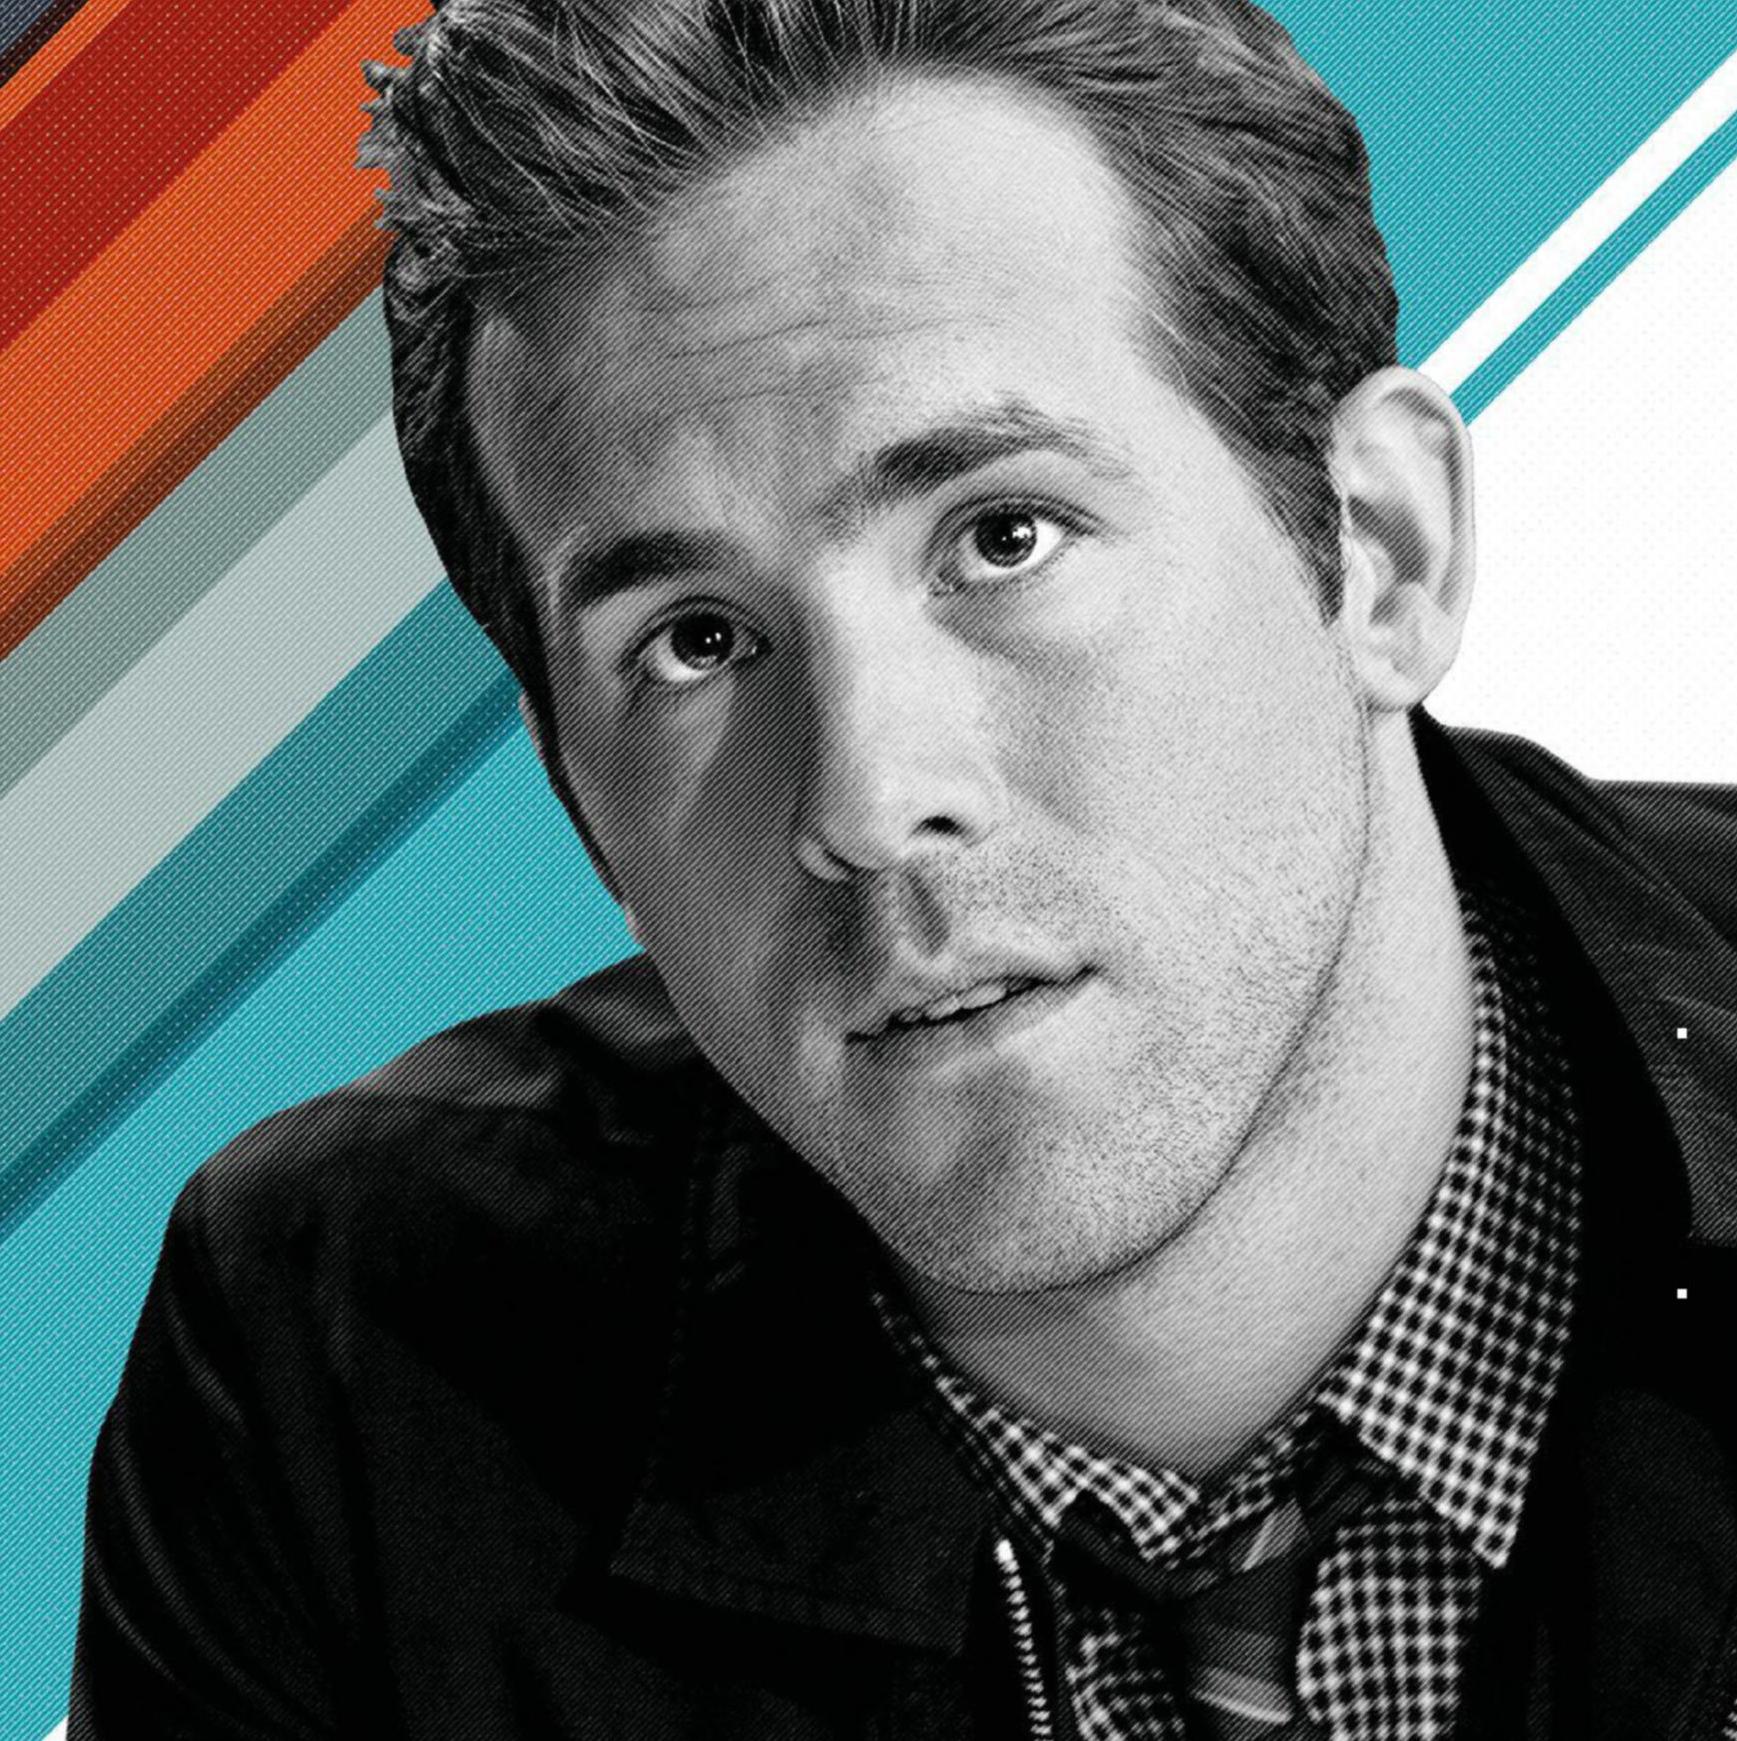 Men S Health Singapore: Deadpool Star Ryan Reynolds Is Exactly Like You